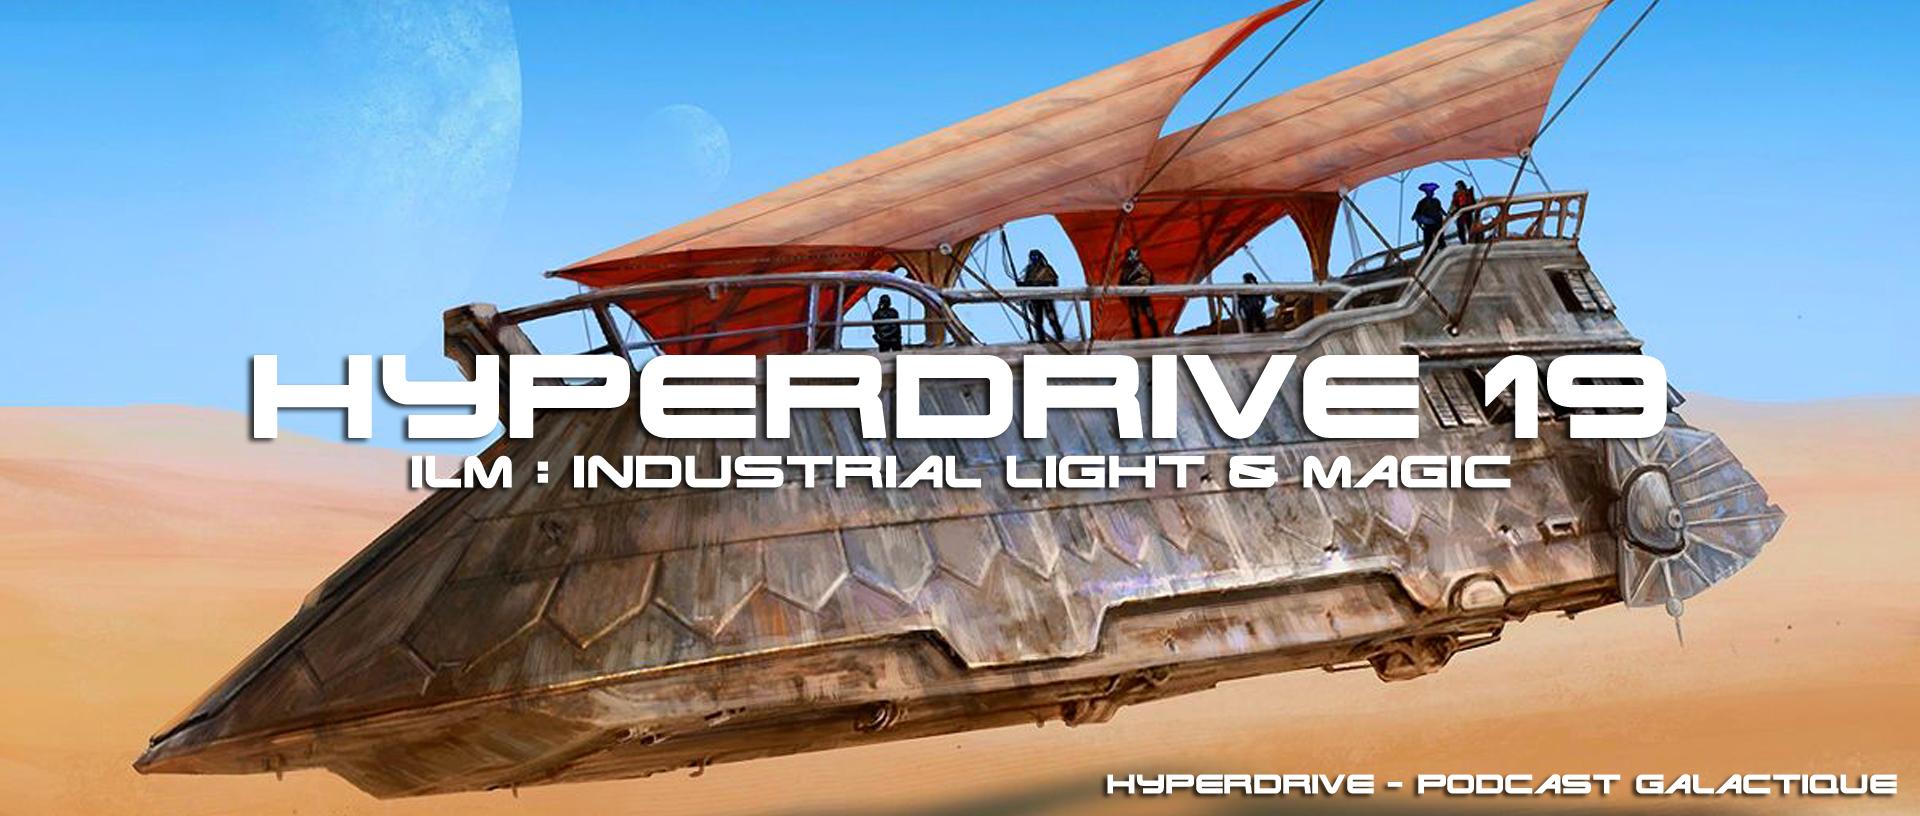 hyperdrive 19 - ILM - Podcast Star Wars